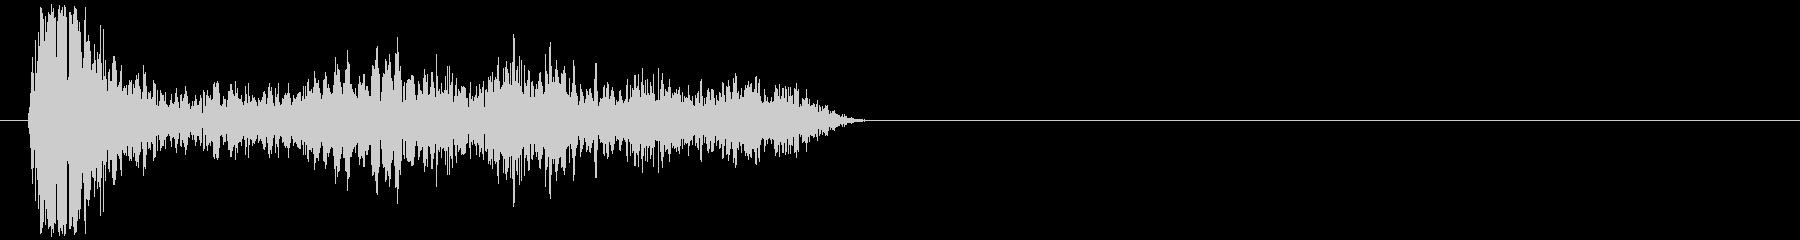 DJ スクラッチ ズクズク デュクデュクの未再生の波形